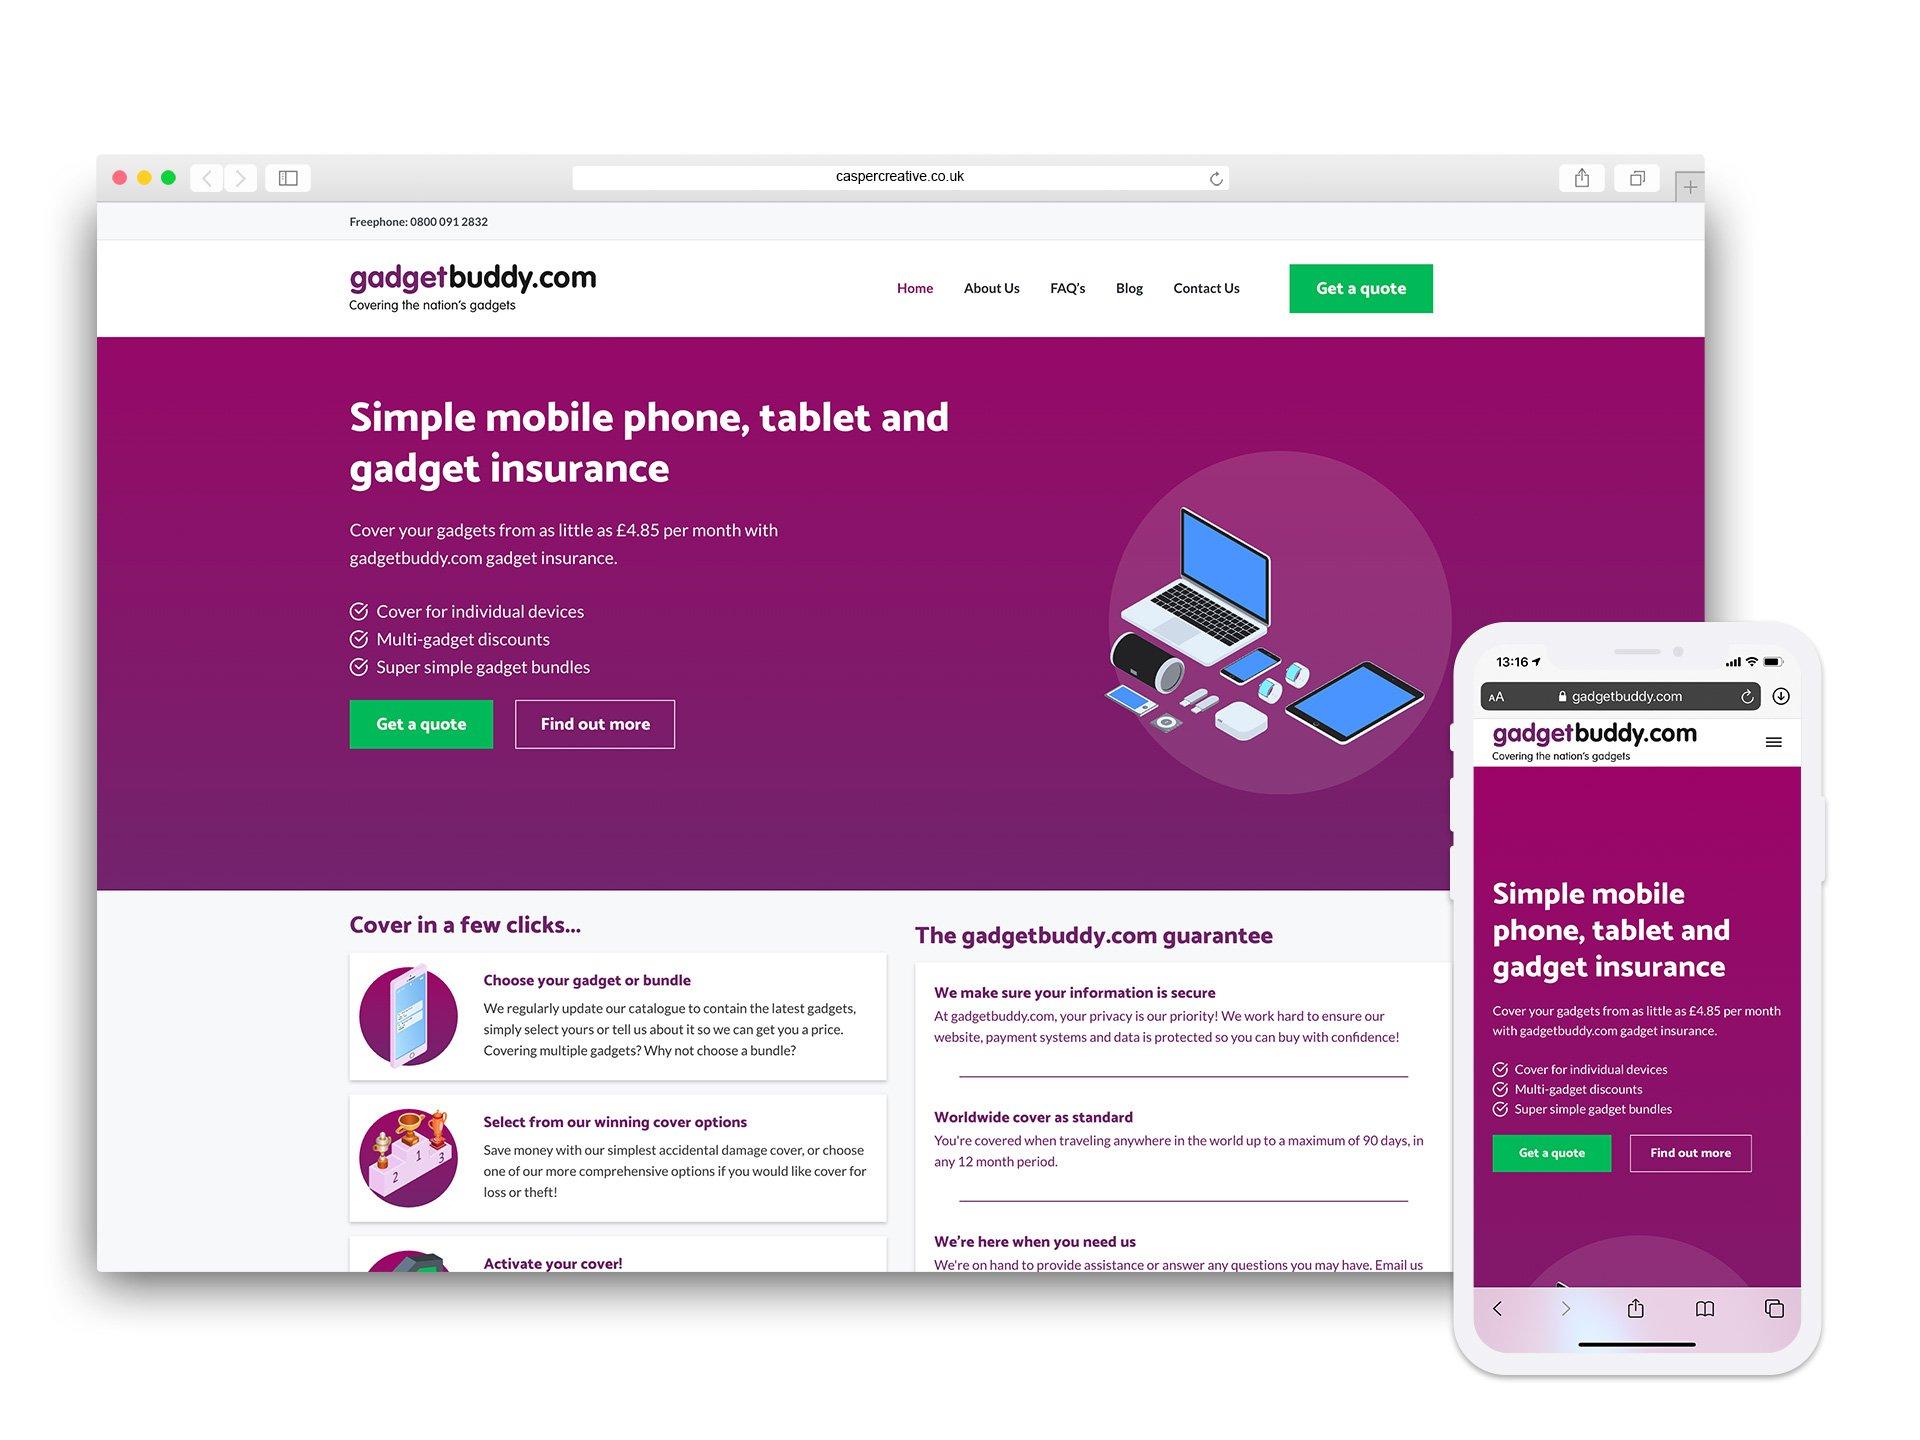 Gadgetbuddy Website - Designed by Casper Creative